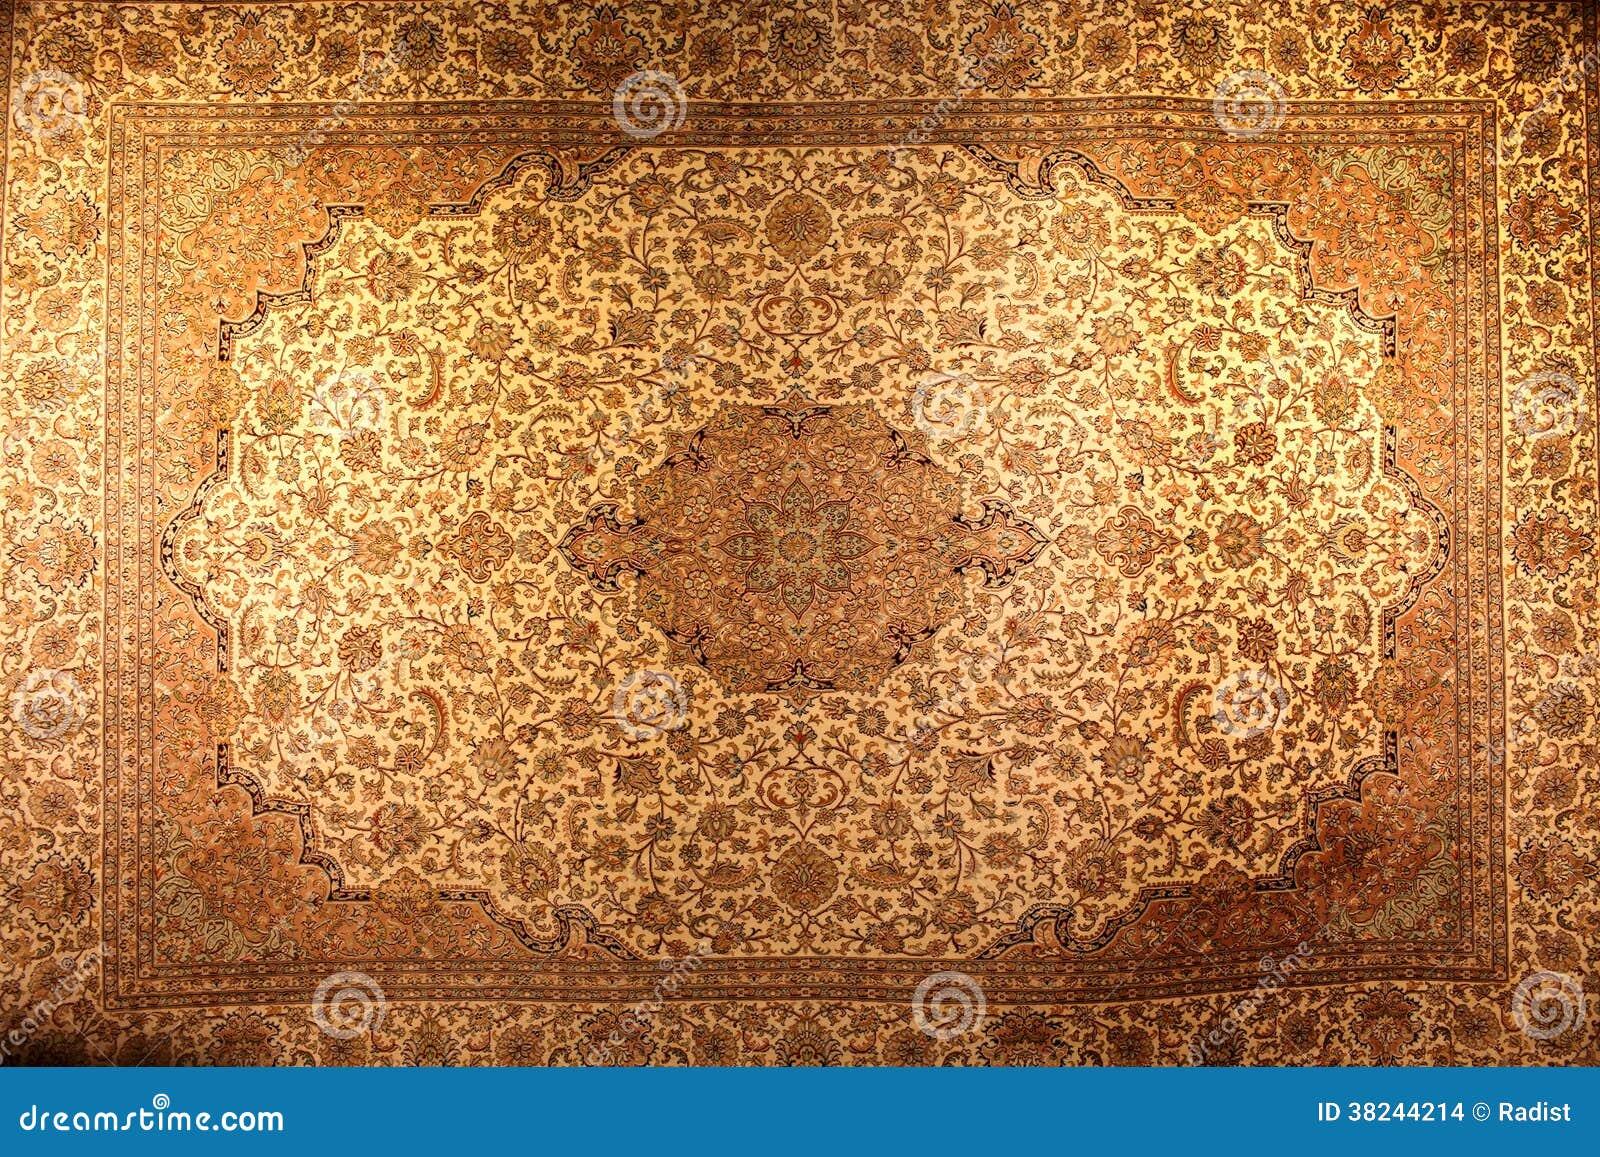 Persian Carpet Texture Stock Images Image 38244214